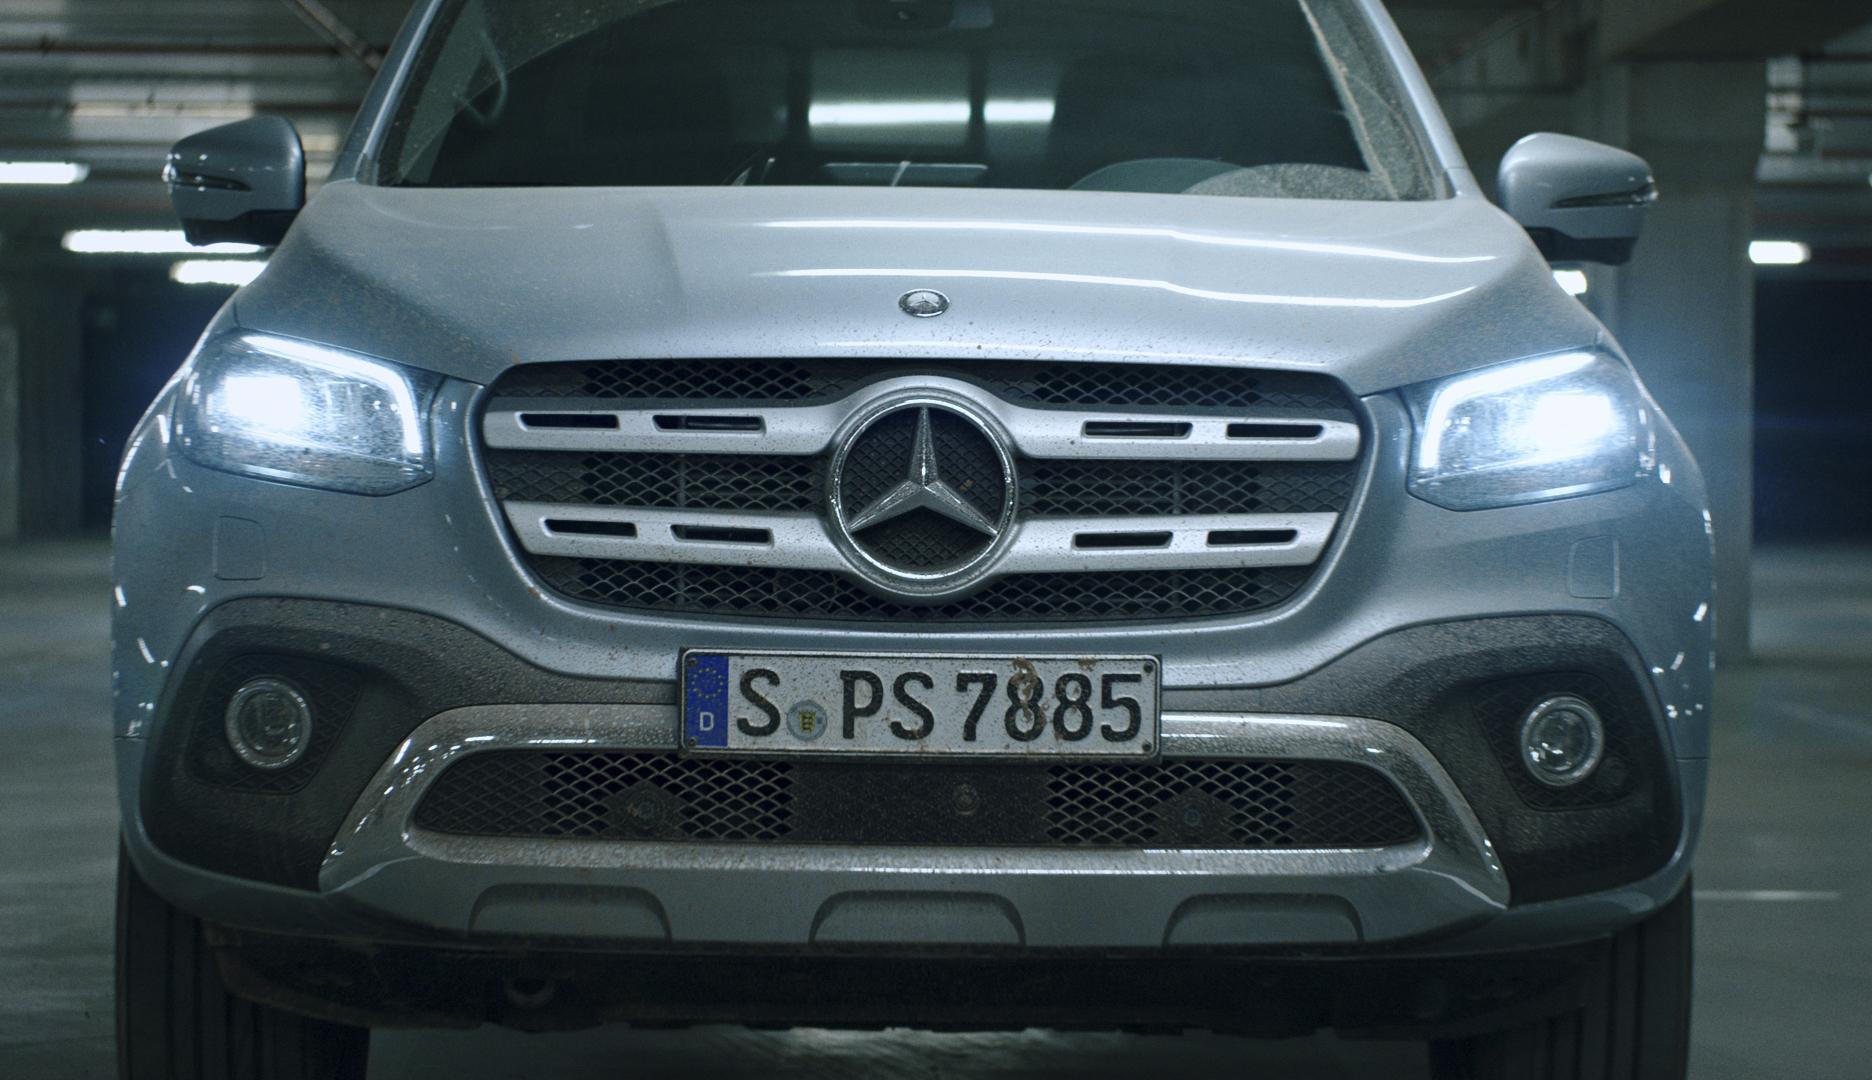 Mercedes X-Class - Eyes_1.10.1.jpg